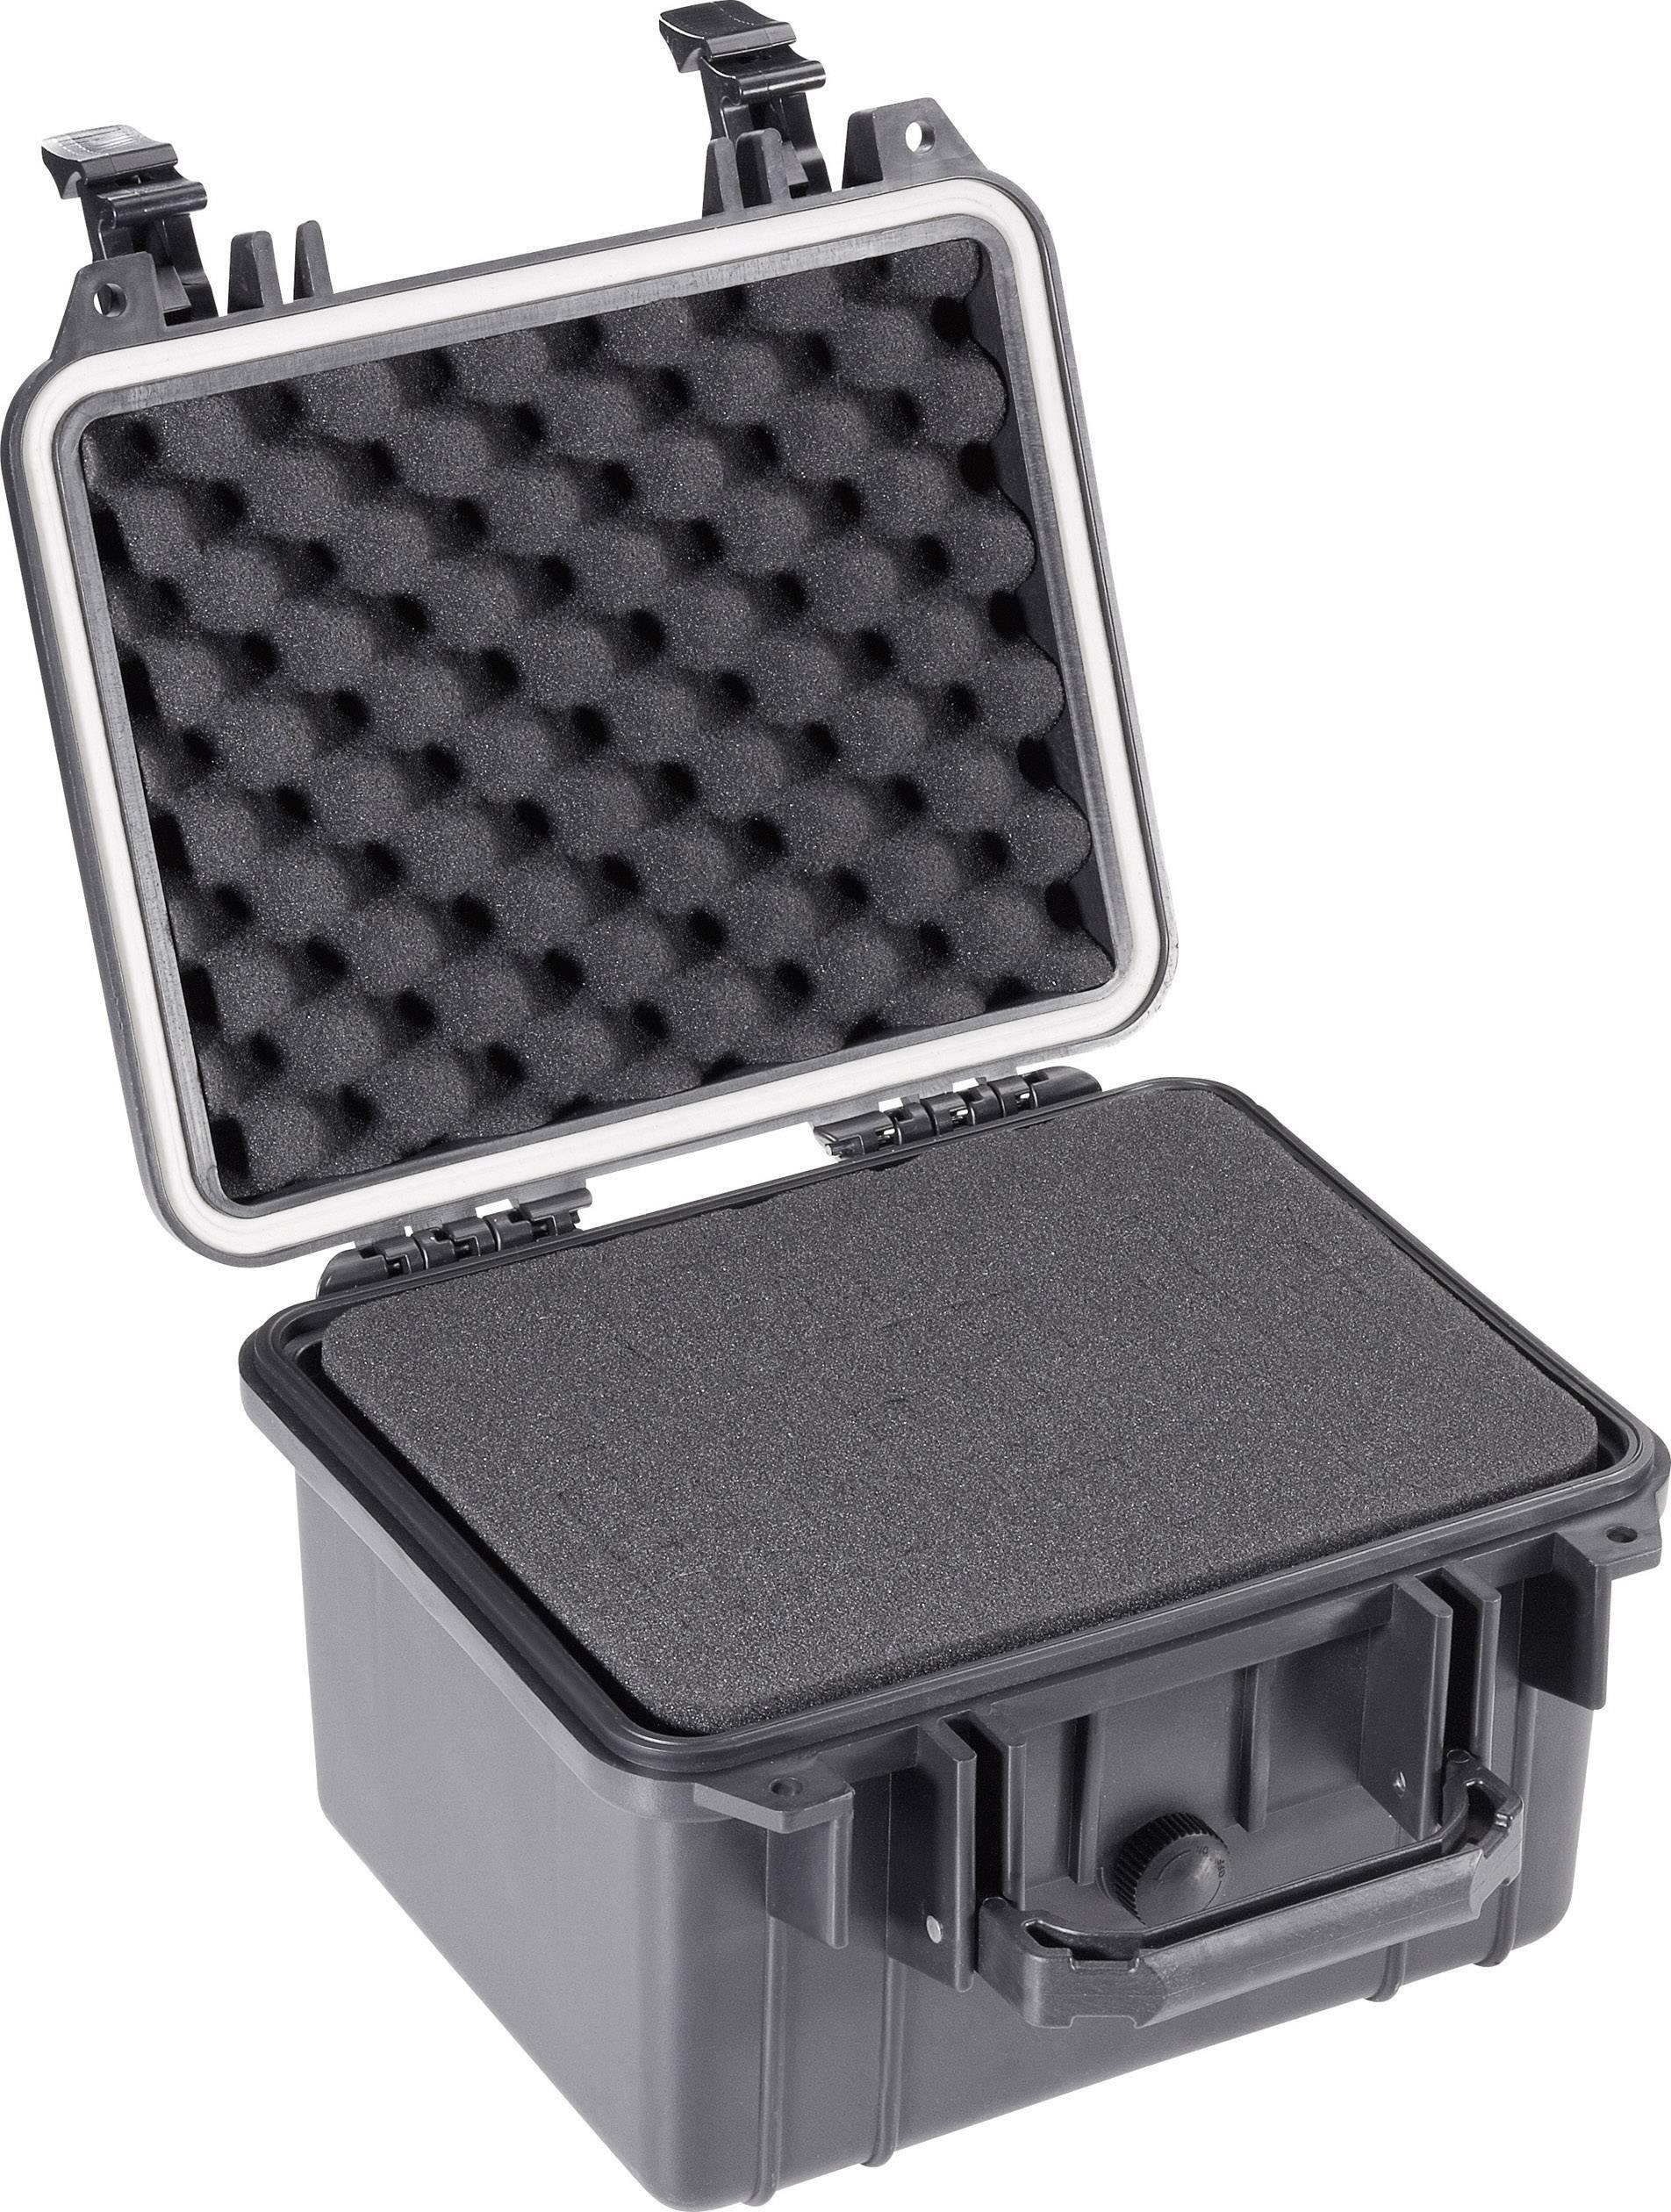 Outdoorový kufor basetech 658800, 260 x 245 x 175 mm